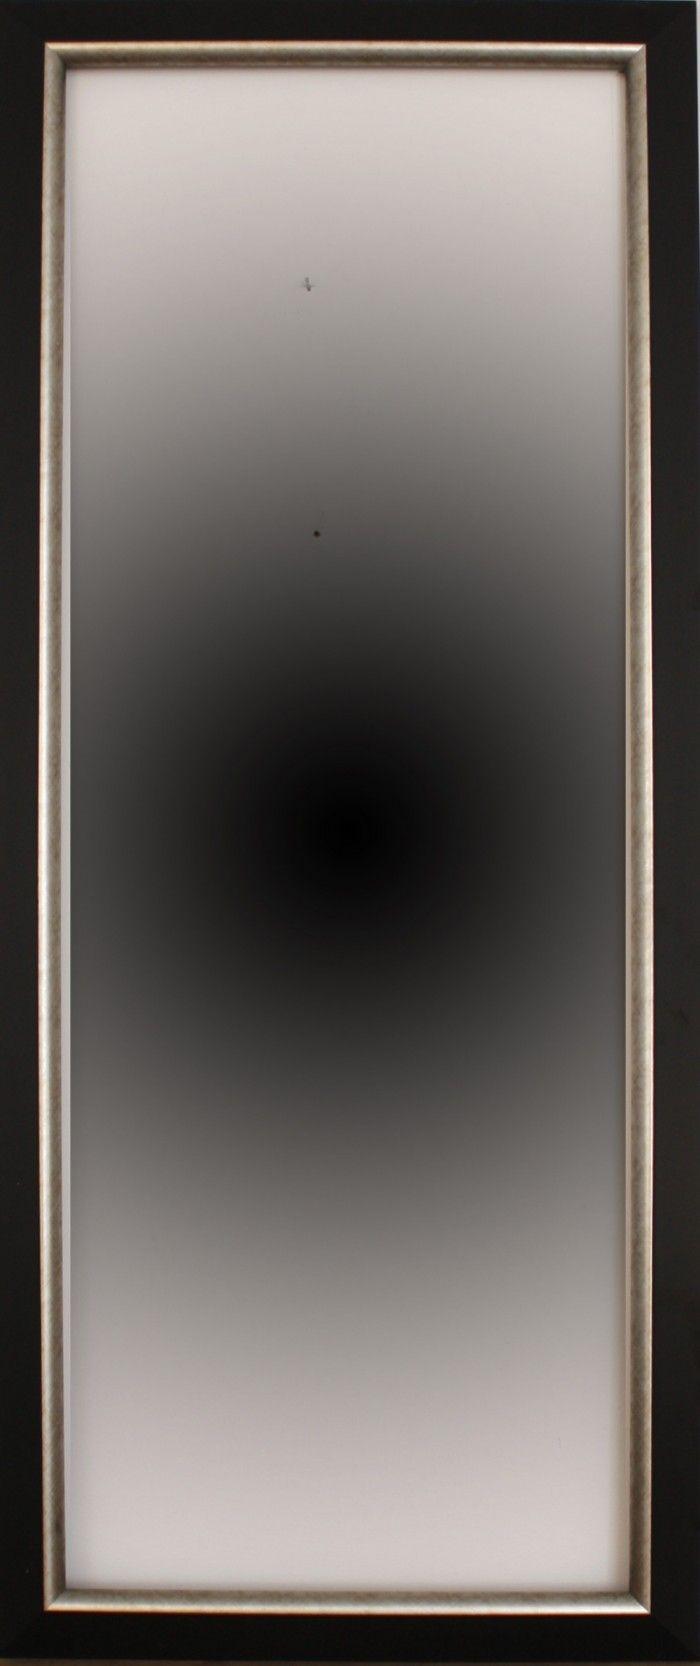 speil 45x120 cm - TABERNA RAMME AS - Orlando - Møbelringen